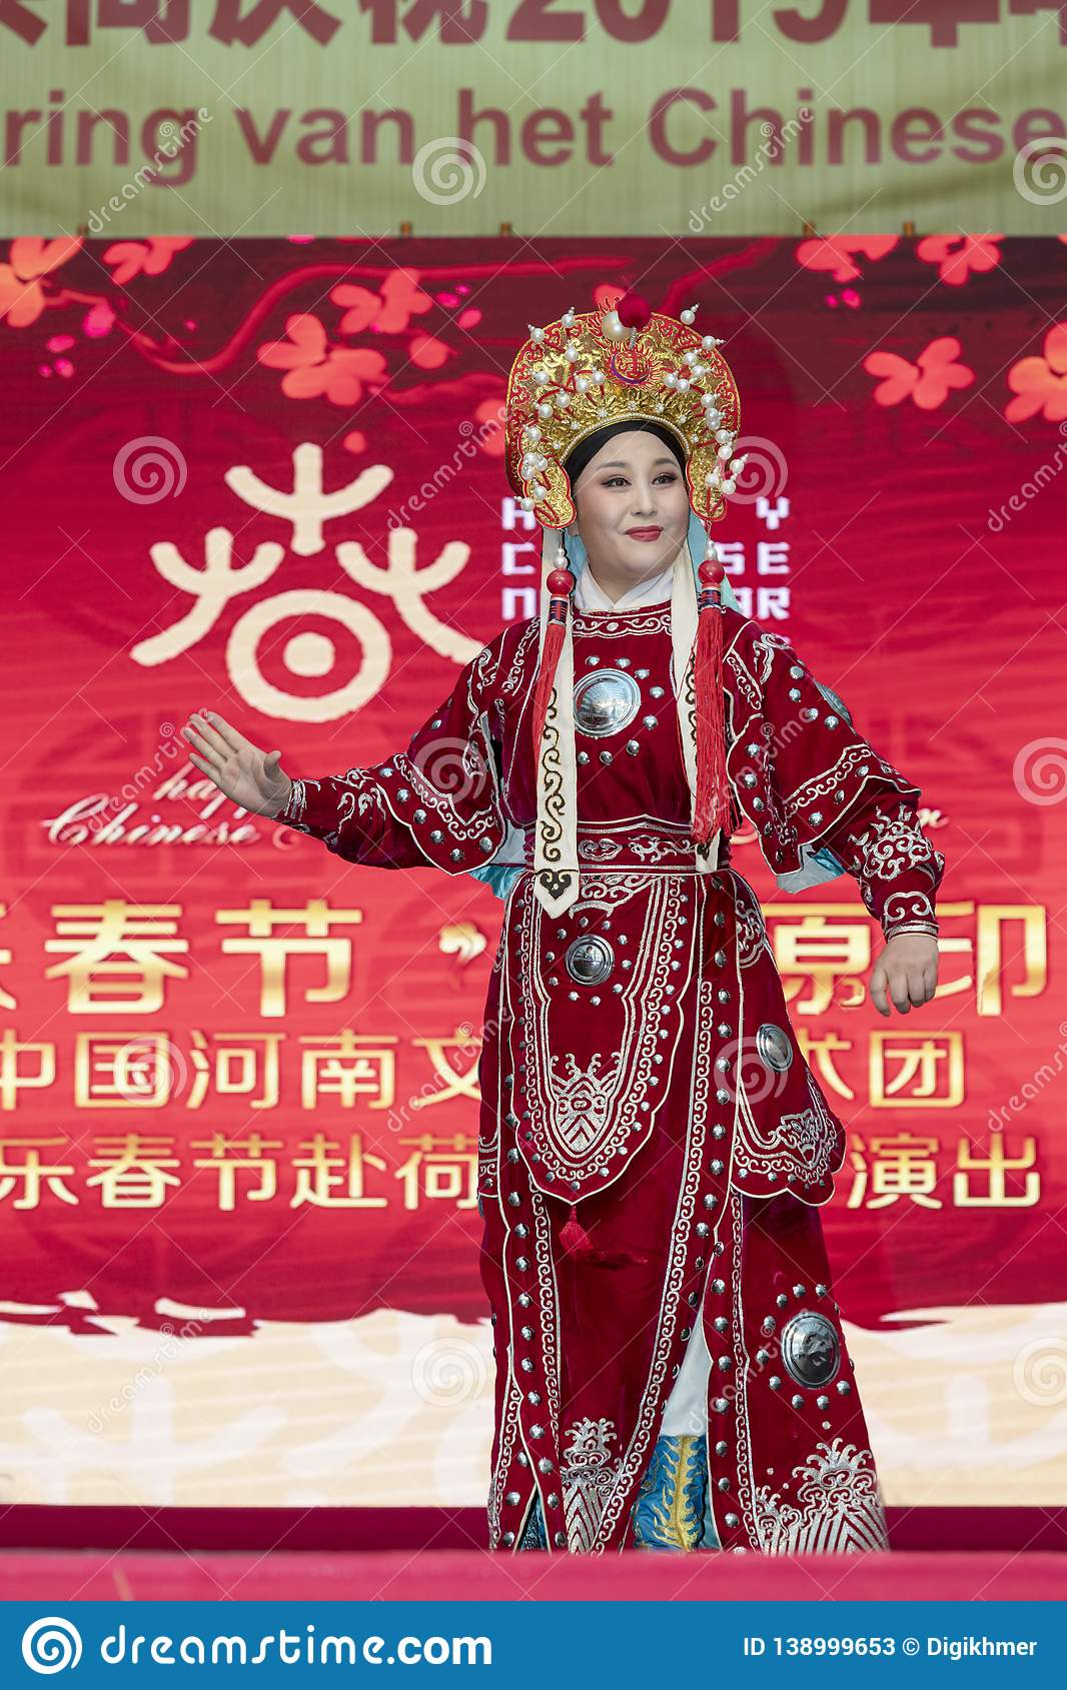 Chinese New Year 2019 - Opera